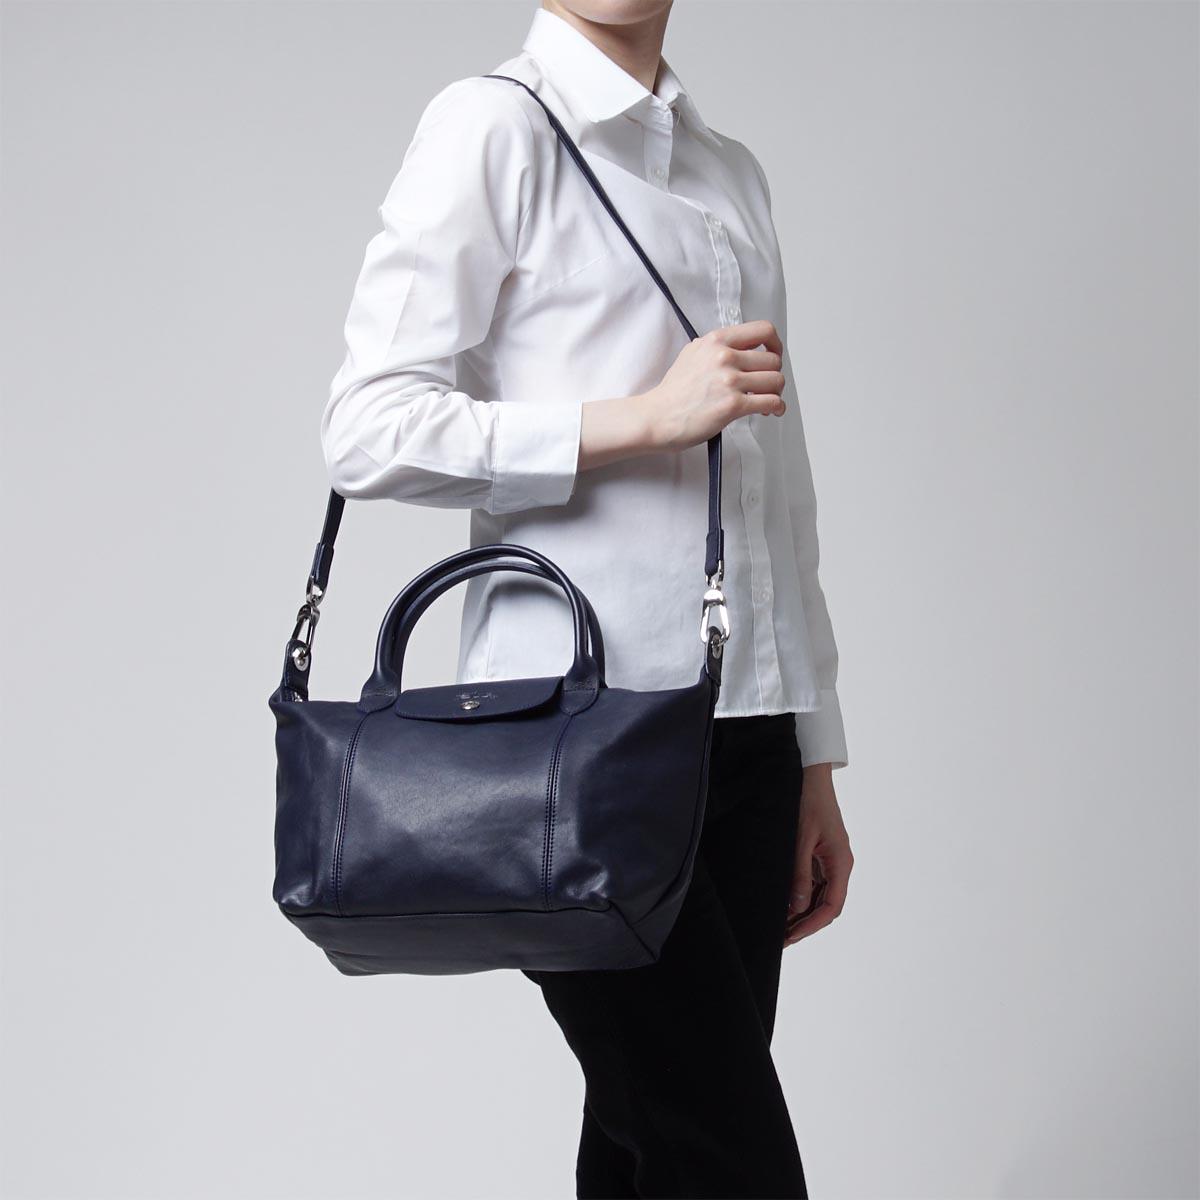 Shop For Light Longchamp Travel Bags 1512 737 001 Noir